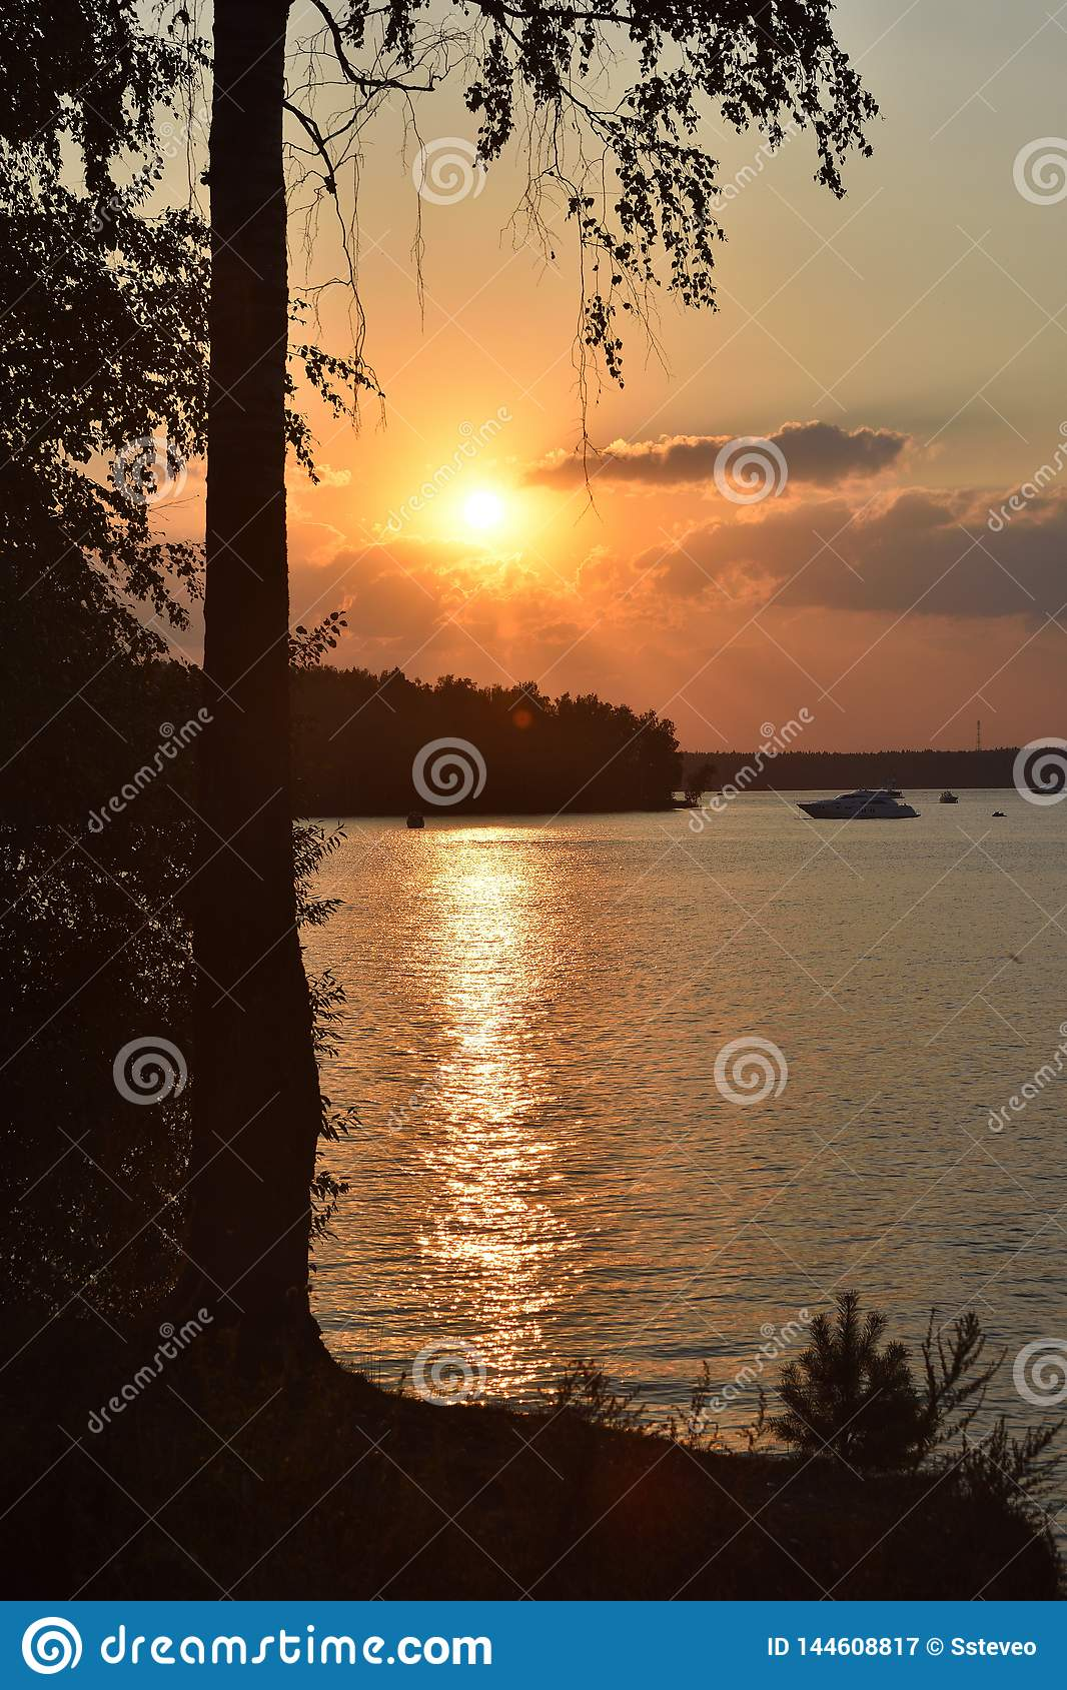 Solnedgång på sjön, kontur av en björk på en solnedgångbackgroun